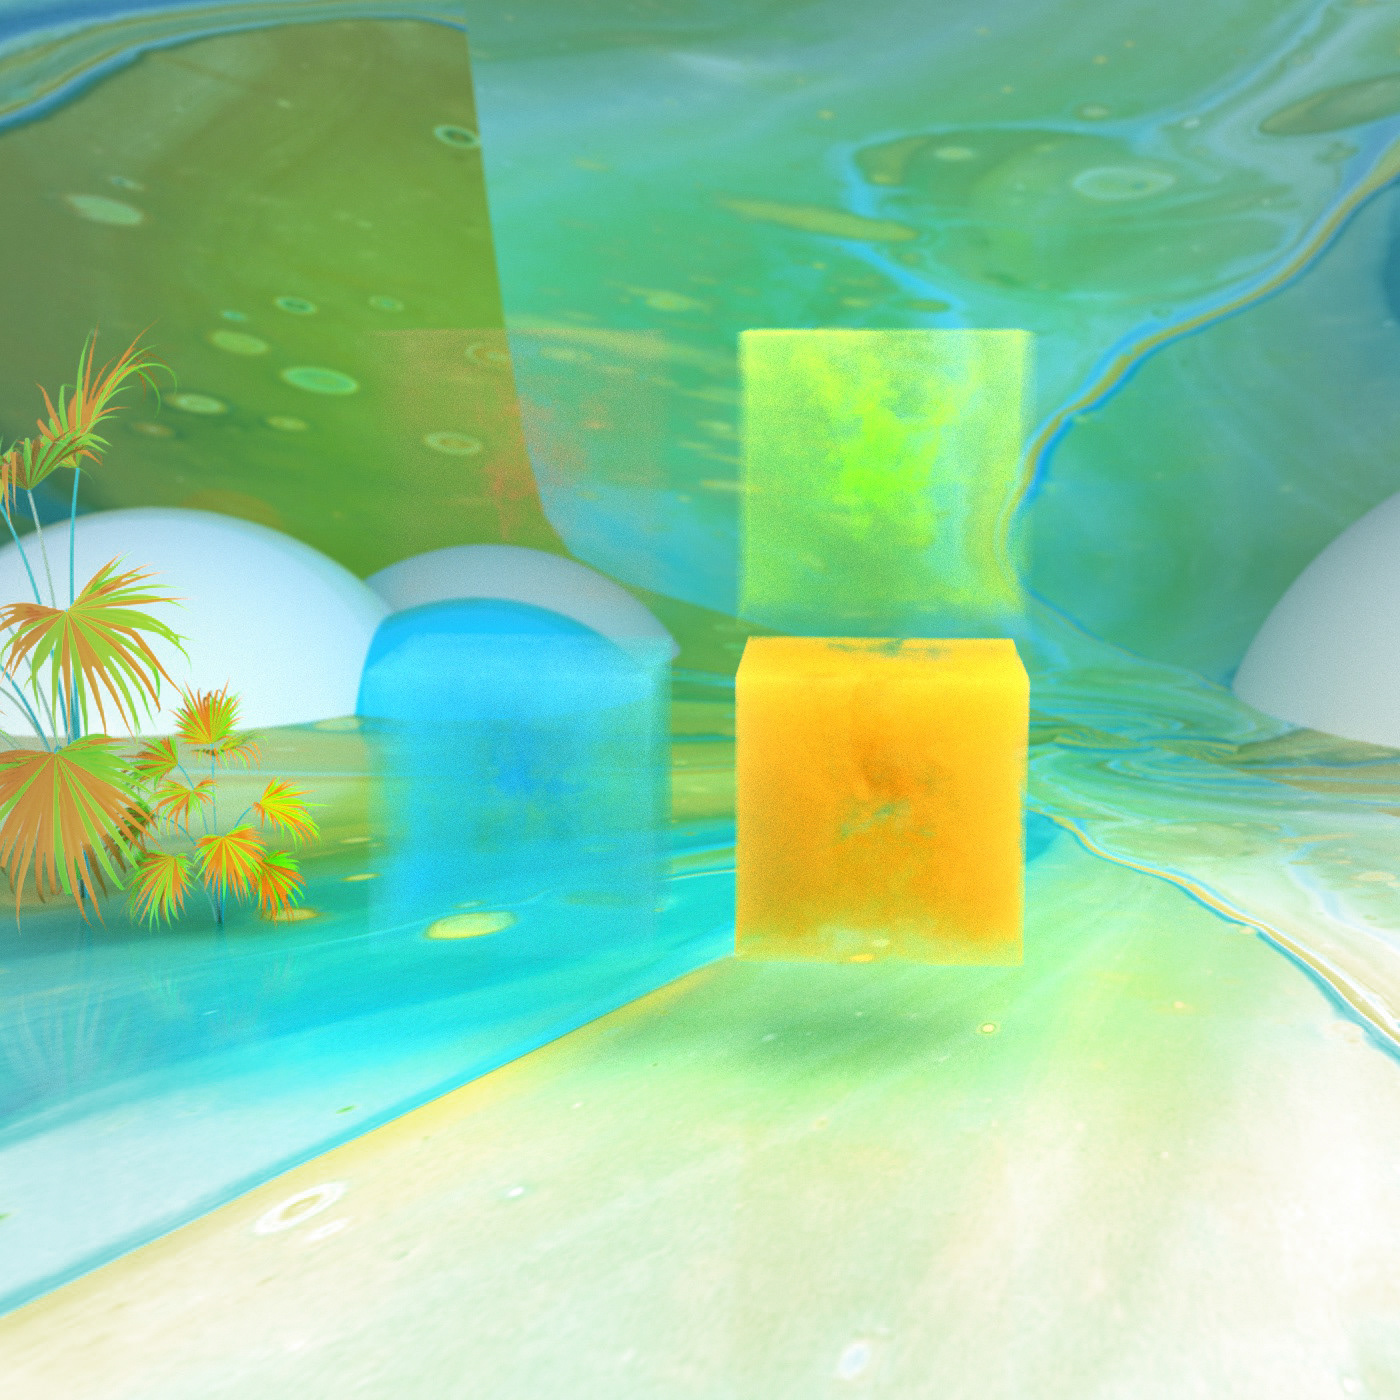 animation  art direction  Fluid Simulation logo Microsoft Microsoft Design Octane Render particle rendering SideFX Houdini